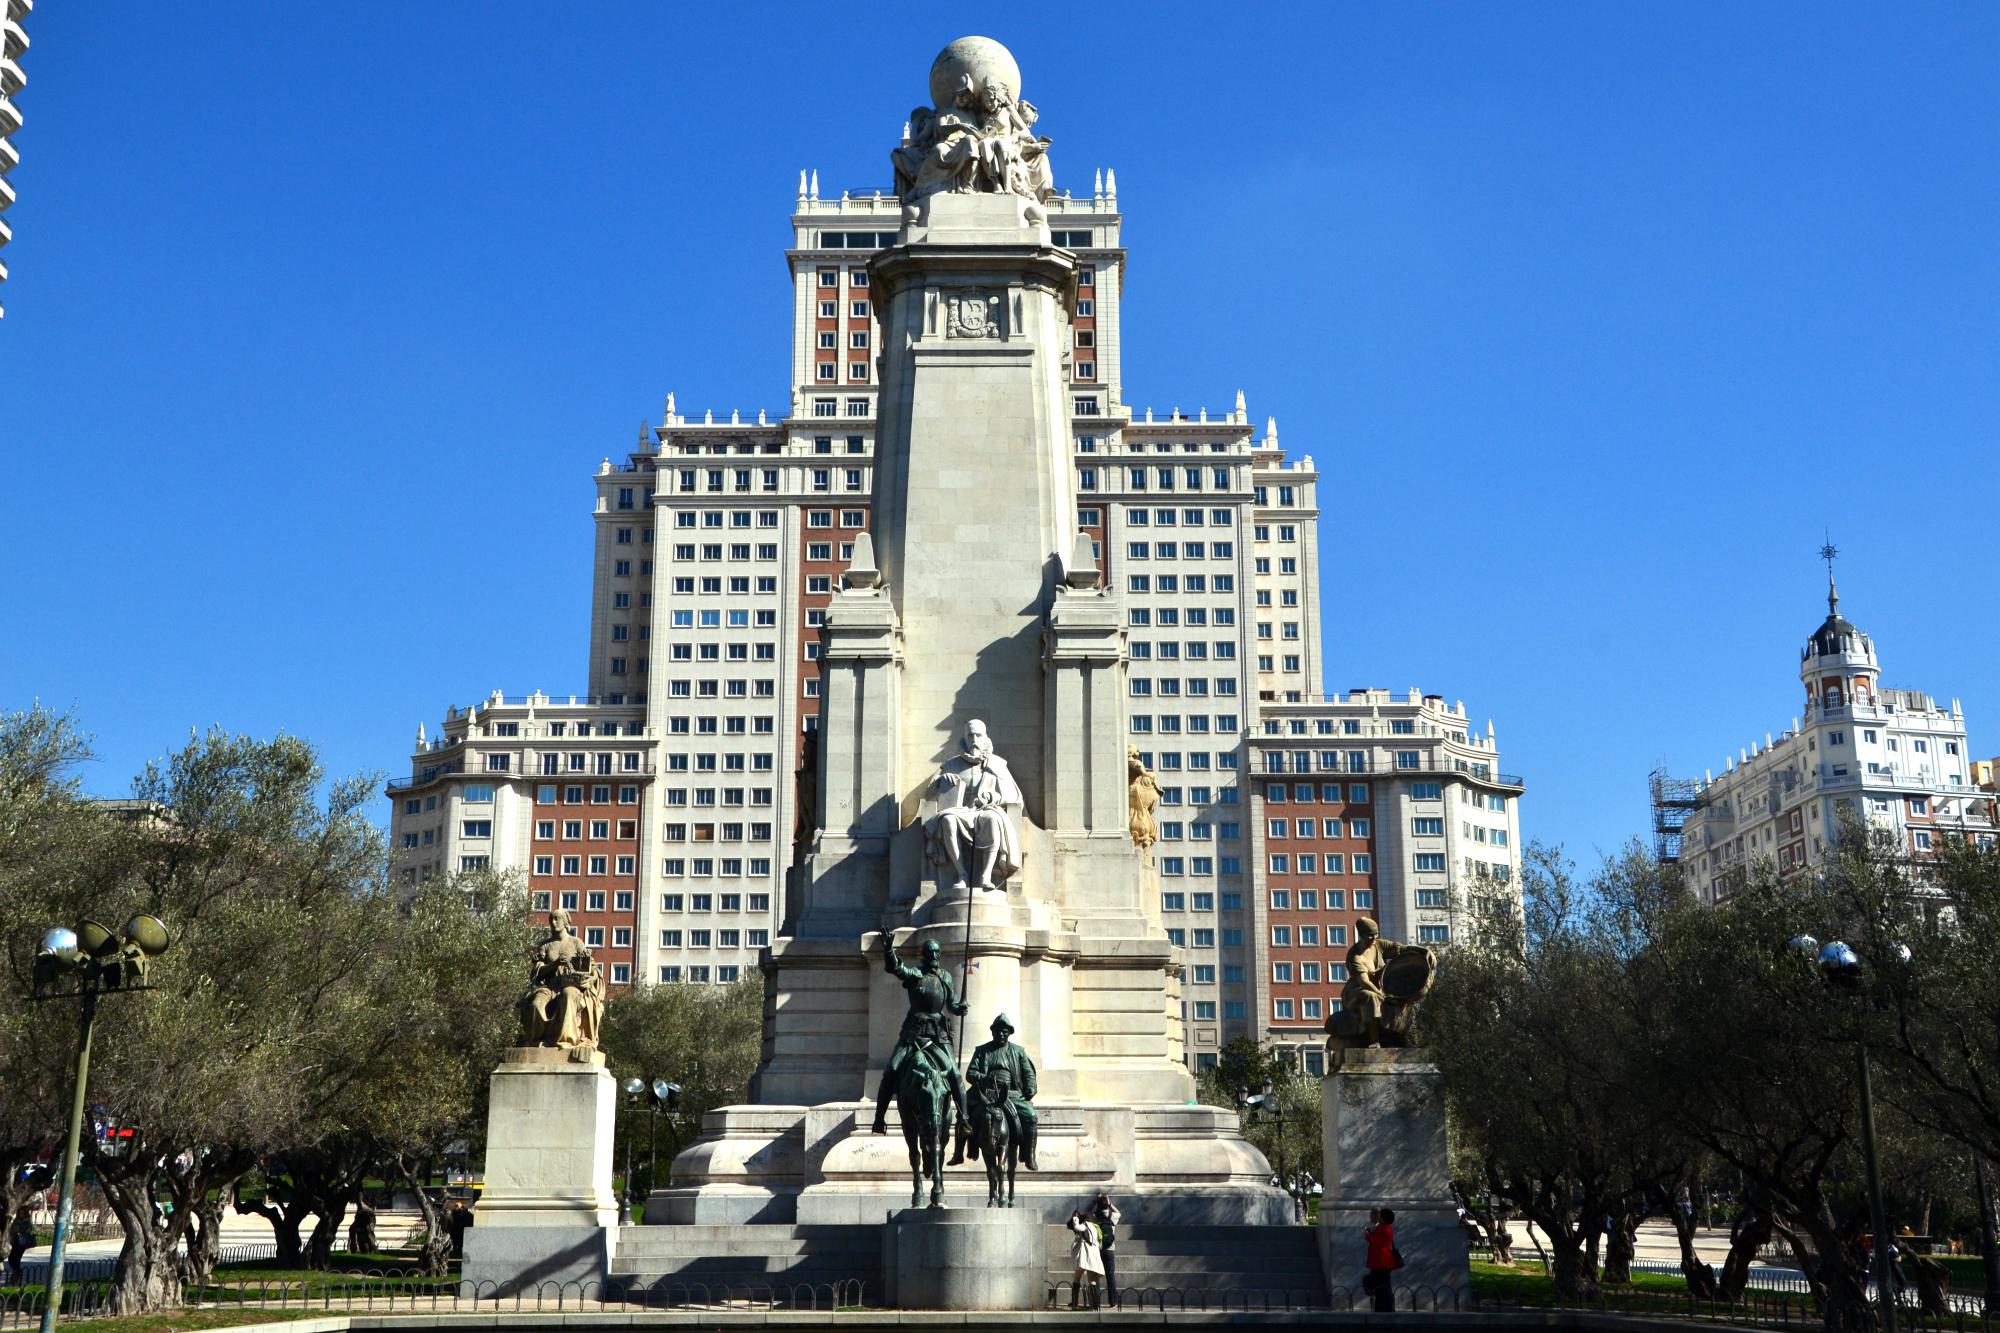 Монумент Мигелю Сервантесу на Площади Испании в Мадриде